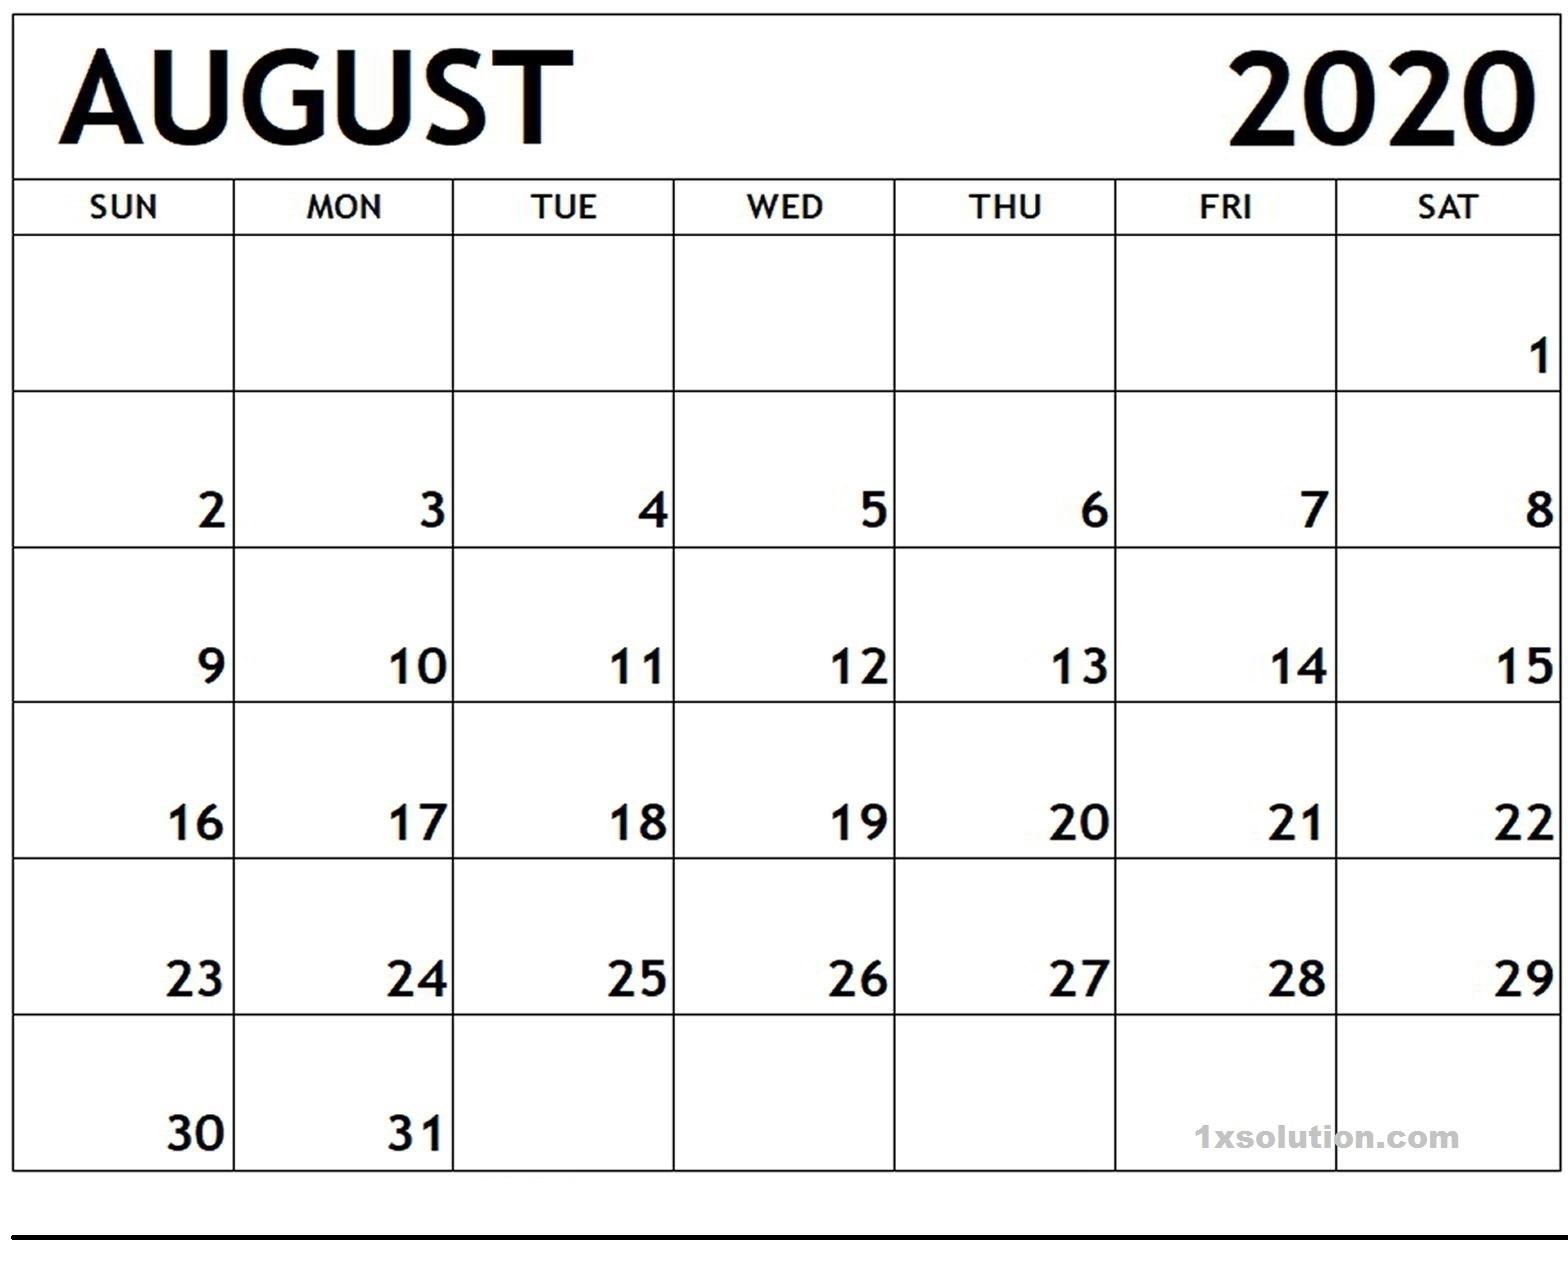 Blank August 2020 Calendar Planner